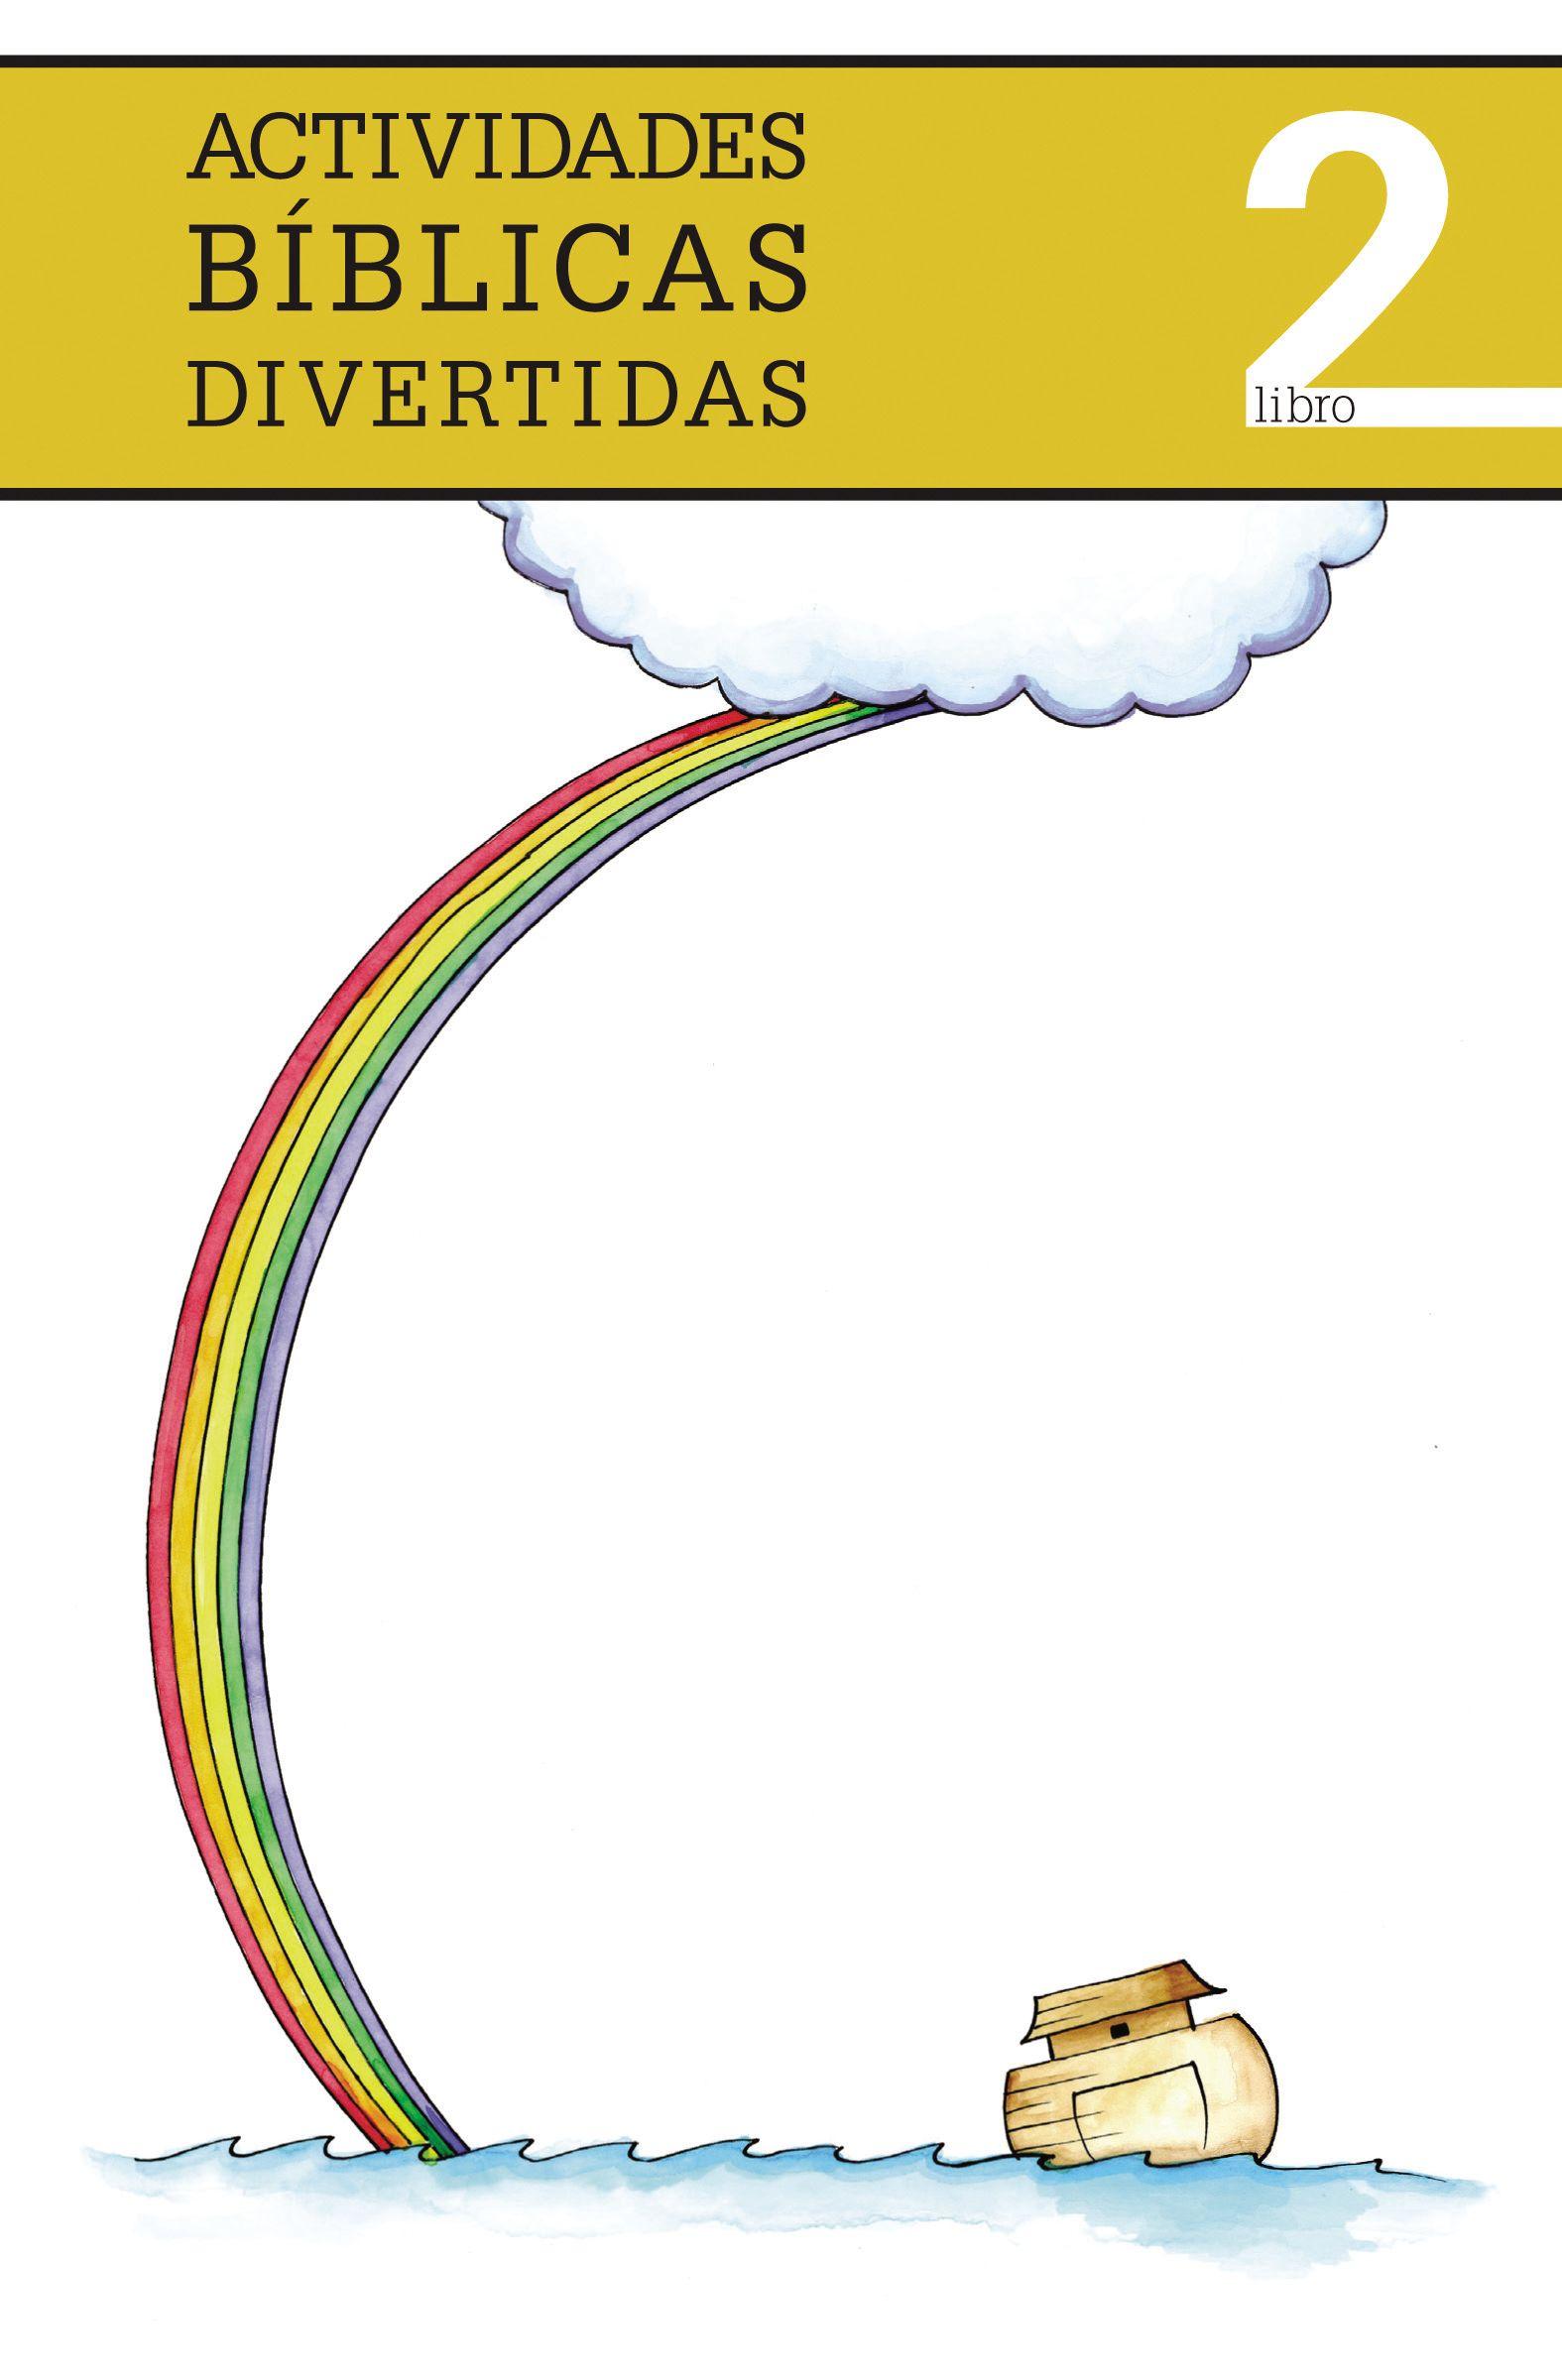 Actividades bíblicas divertidas, libro II